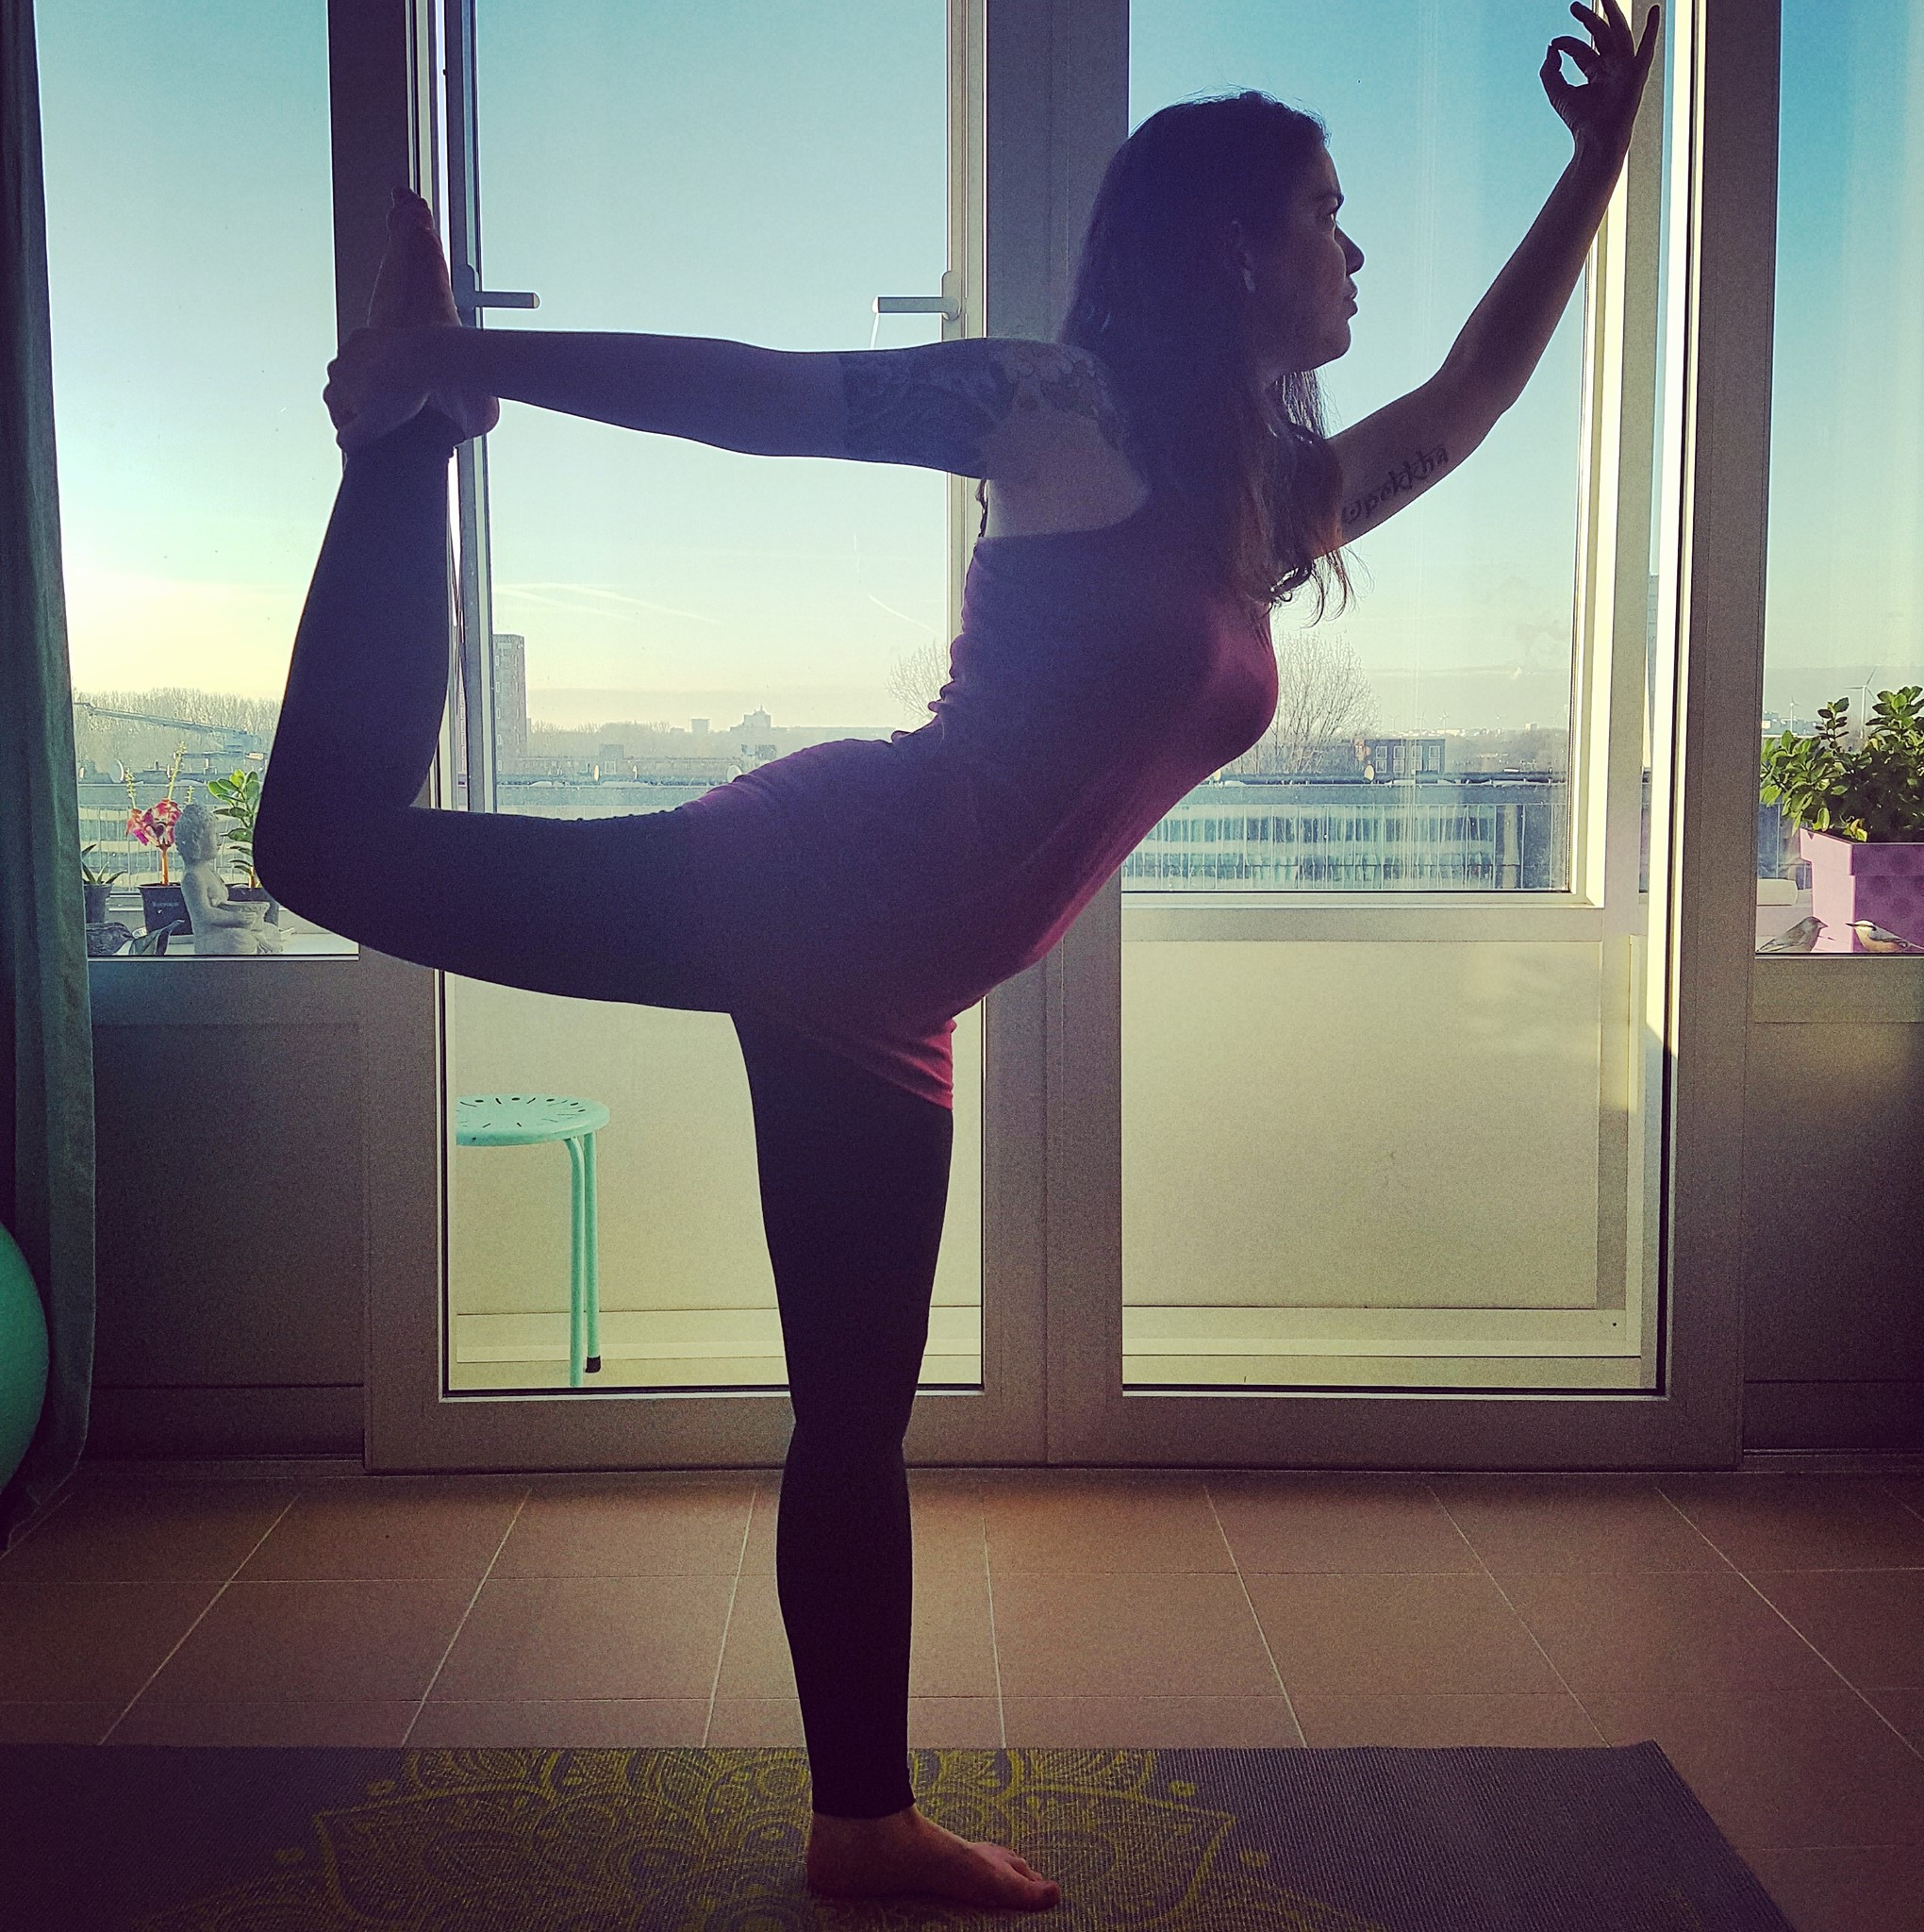 Lord of the dance yoga posture private yoga teacher